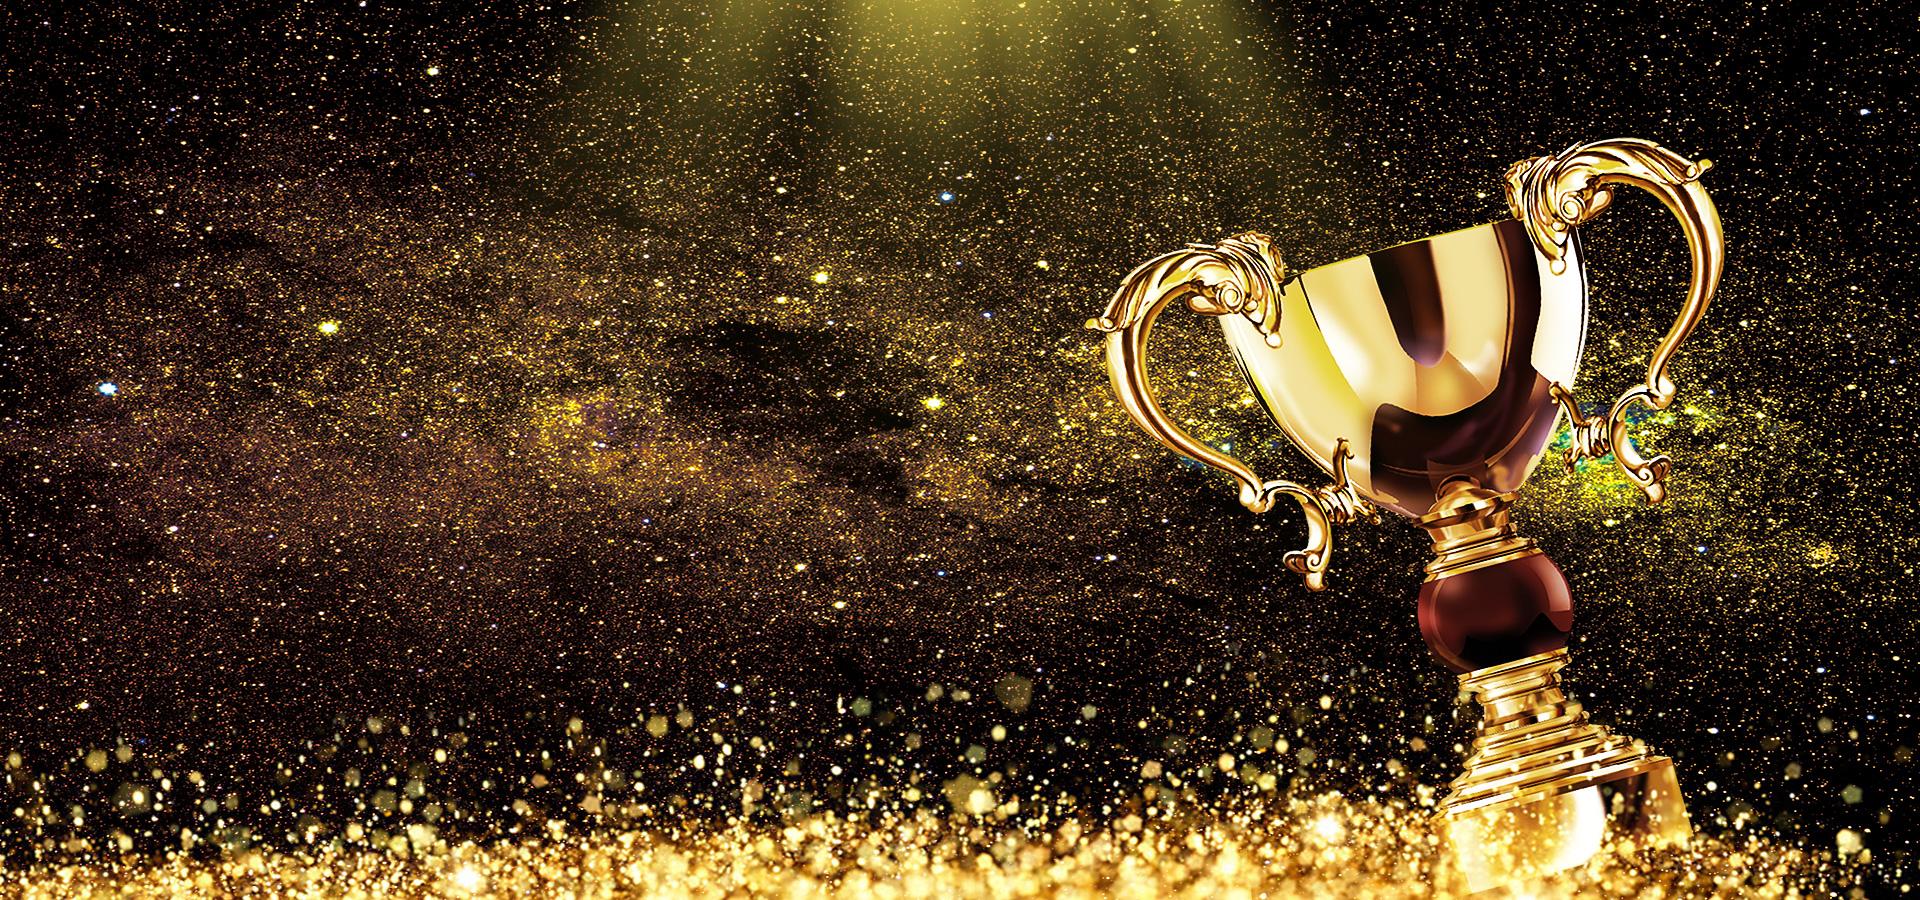 creative luxurious golden trophy award celebration